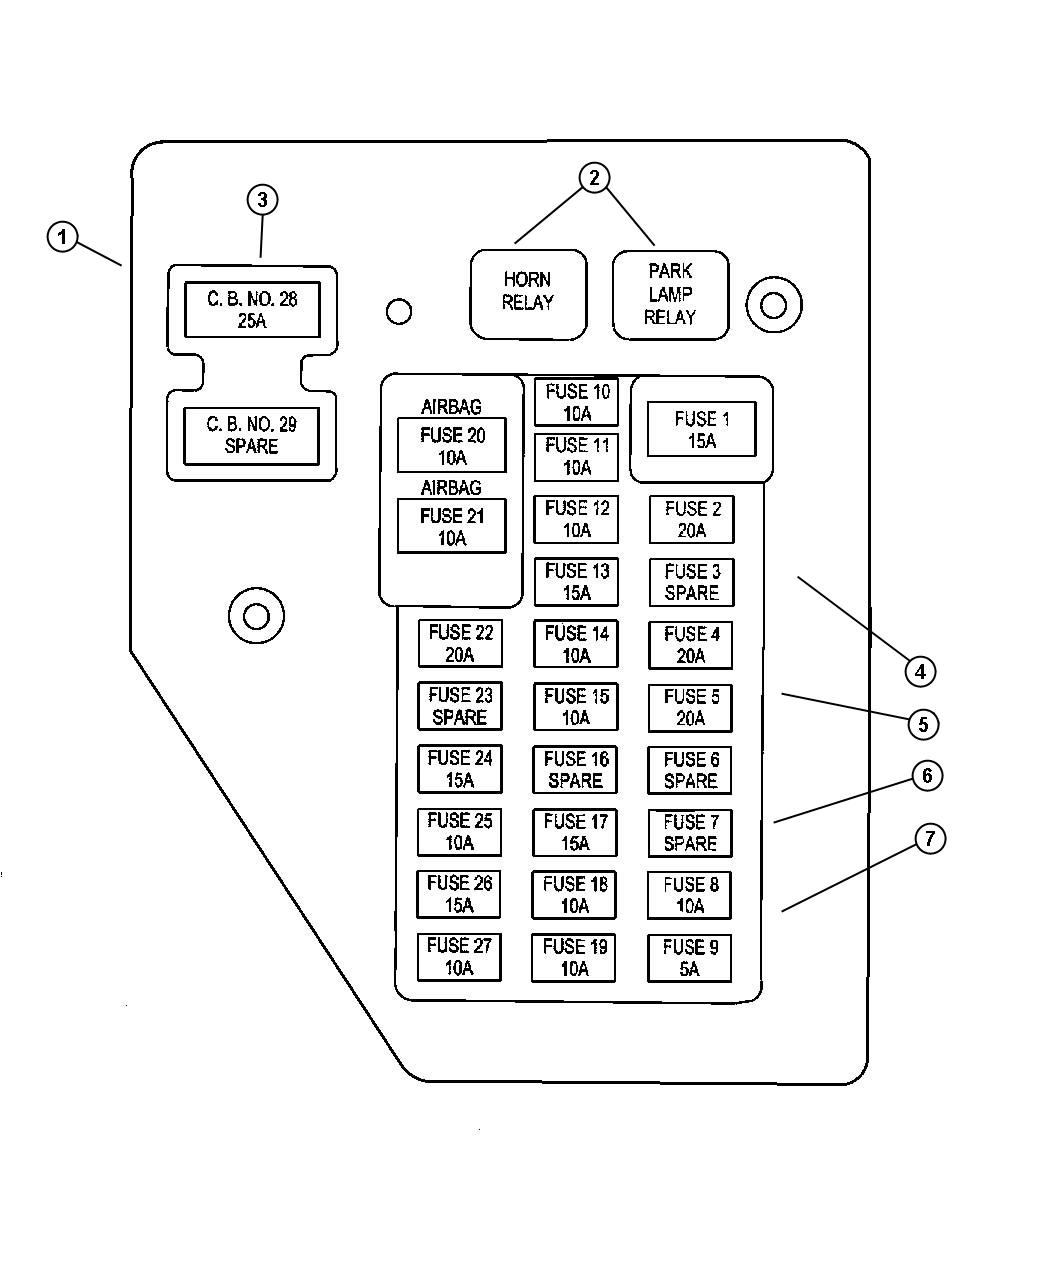 93 Dakota Fuse Box Diagram Wiring Diagram Store Series A Store Series A Pasticceriagele It